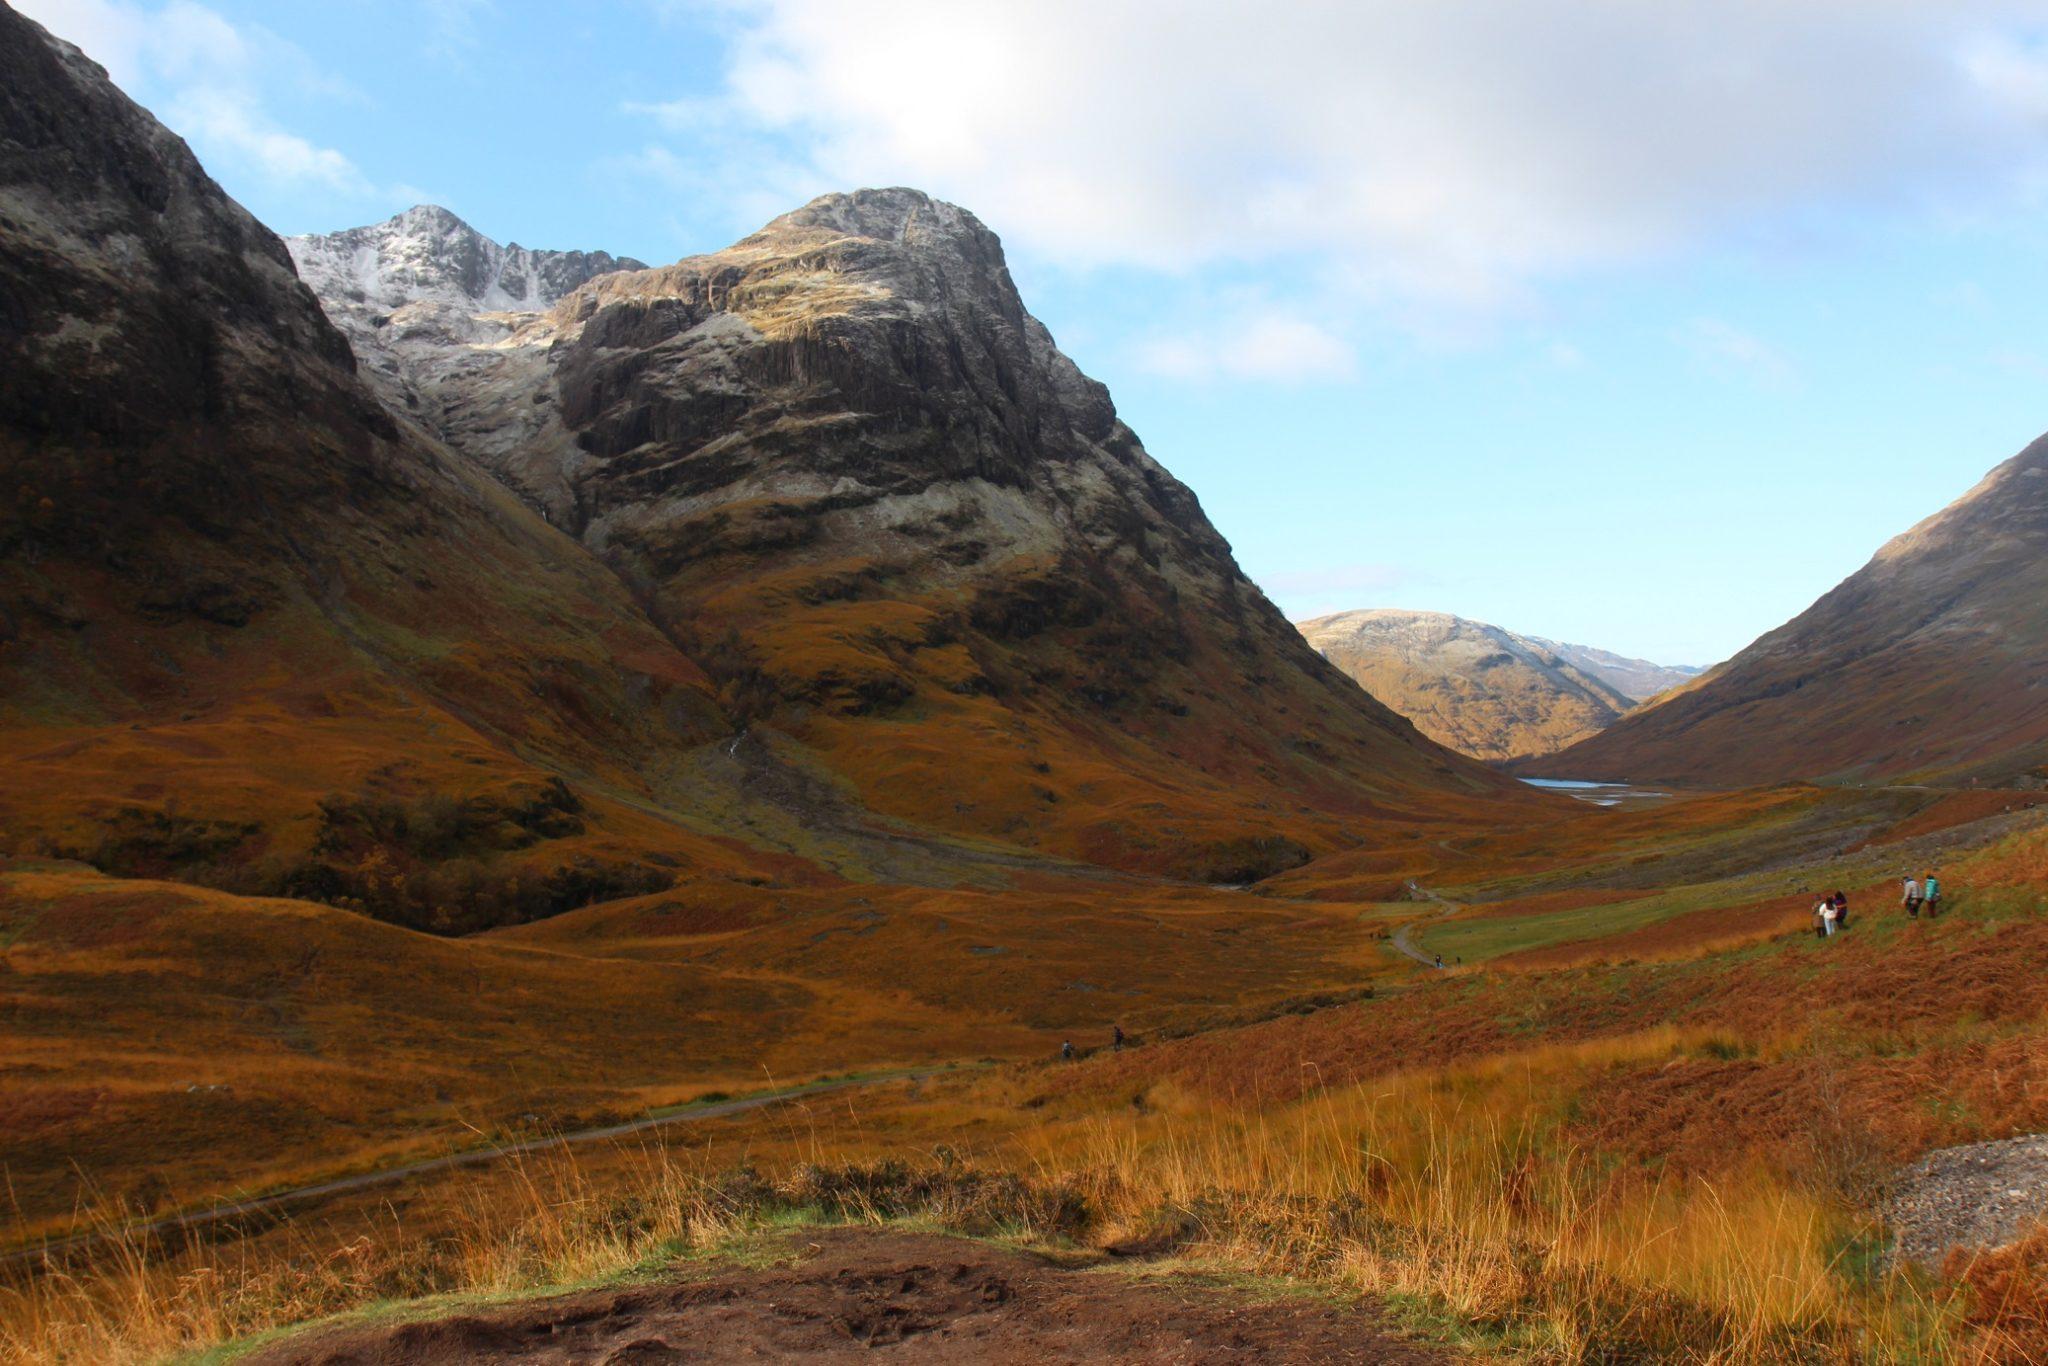 Skotlannin ylängöillä